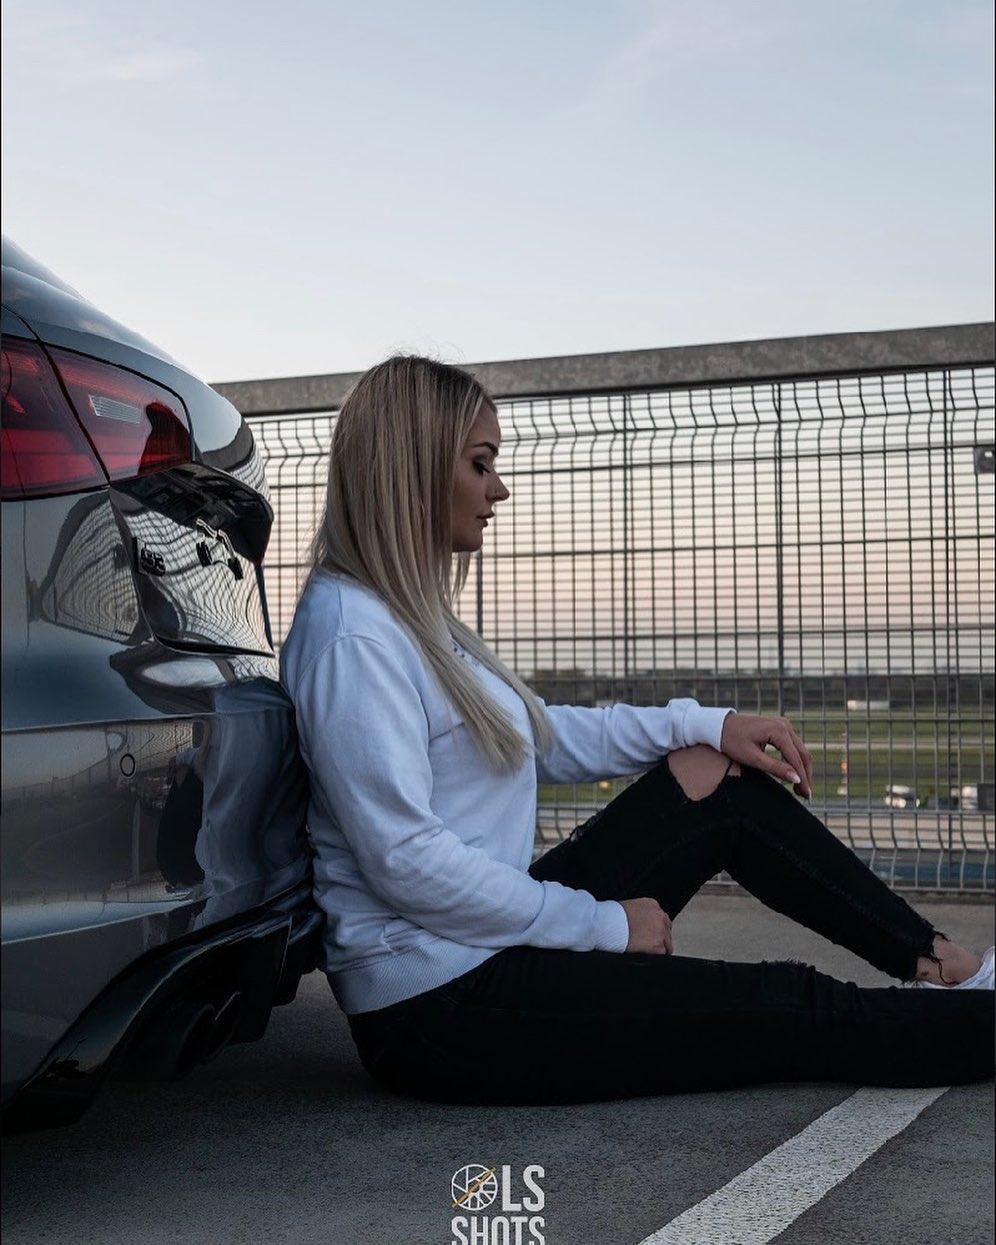 𝑮𝒐𝒐𝒅 𝑴𝒐𝒓𝒏𝒊𝒏𝒈 𝑬𝒗𝒆𝒓𝒚𝒃𝒐𝒅 Cargirl - Tattoos